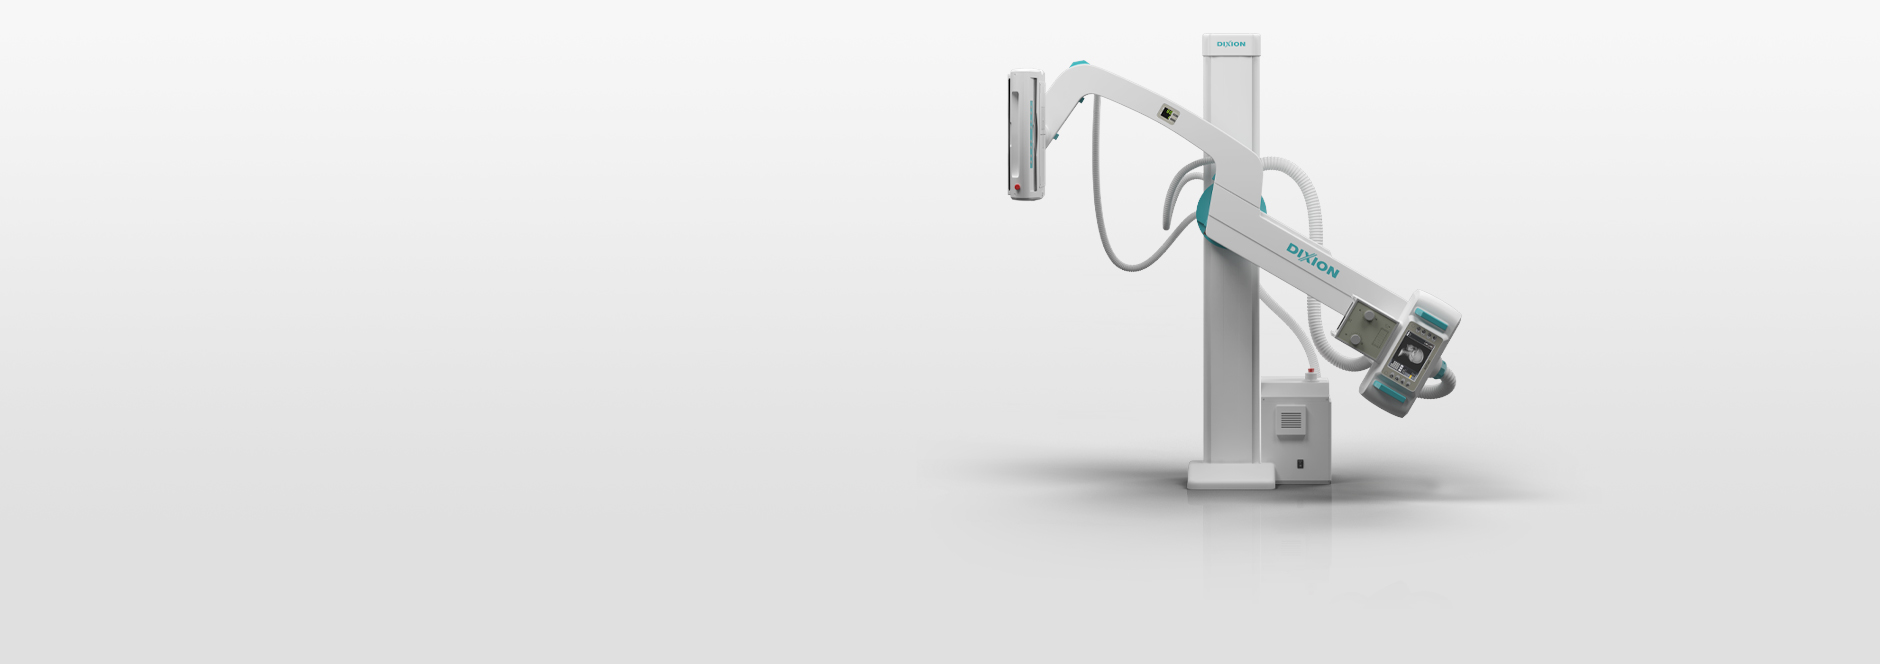 Röntgensysteme